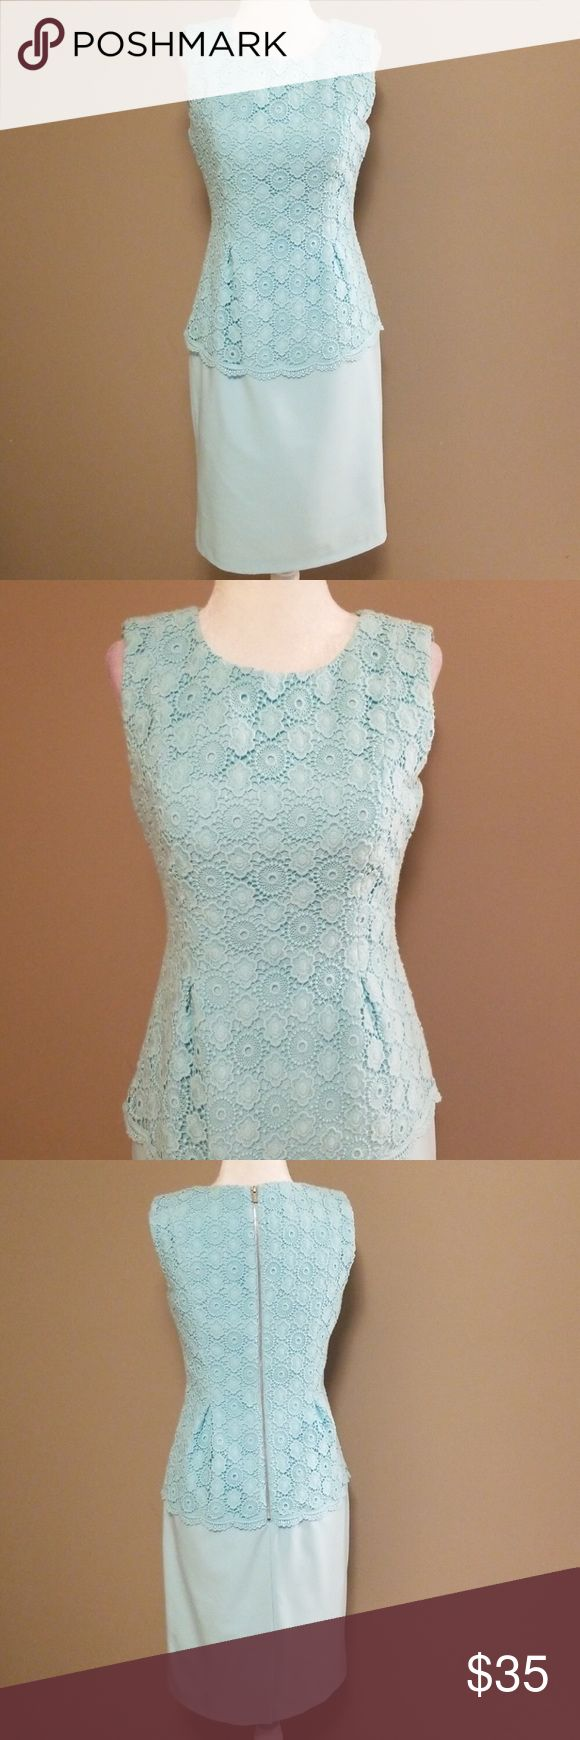 Calvin Klein peplum-stijl jurk Mooi robin ei blauw. Perfect voor zomerhuwelijk …